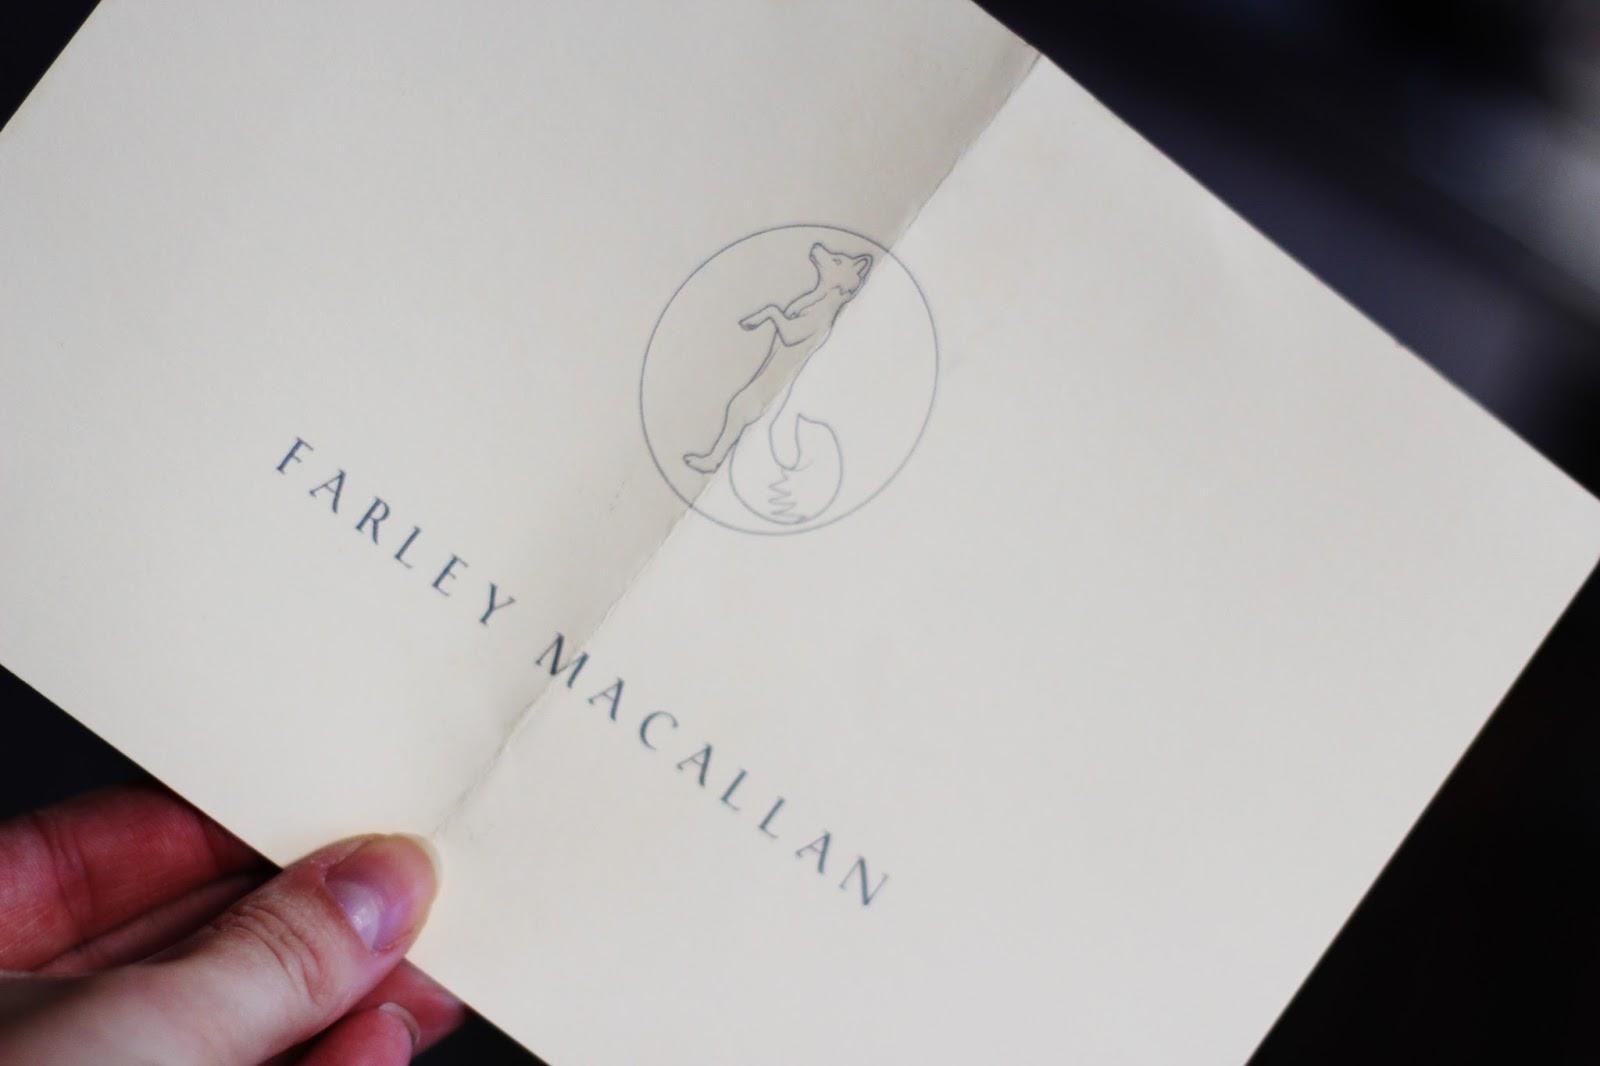 farley macallan hackney